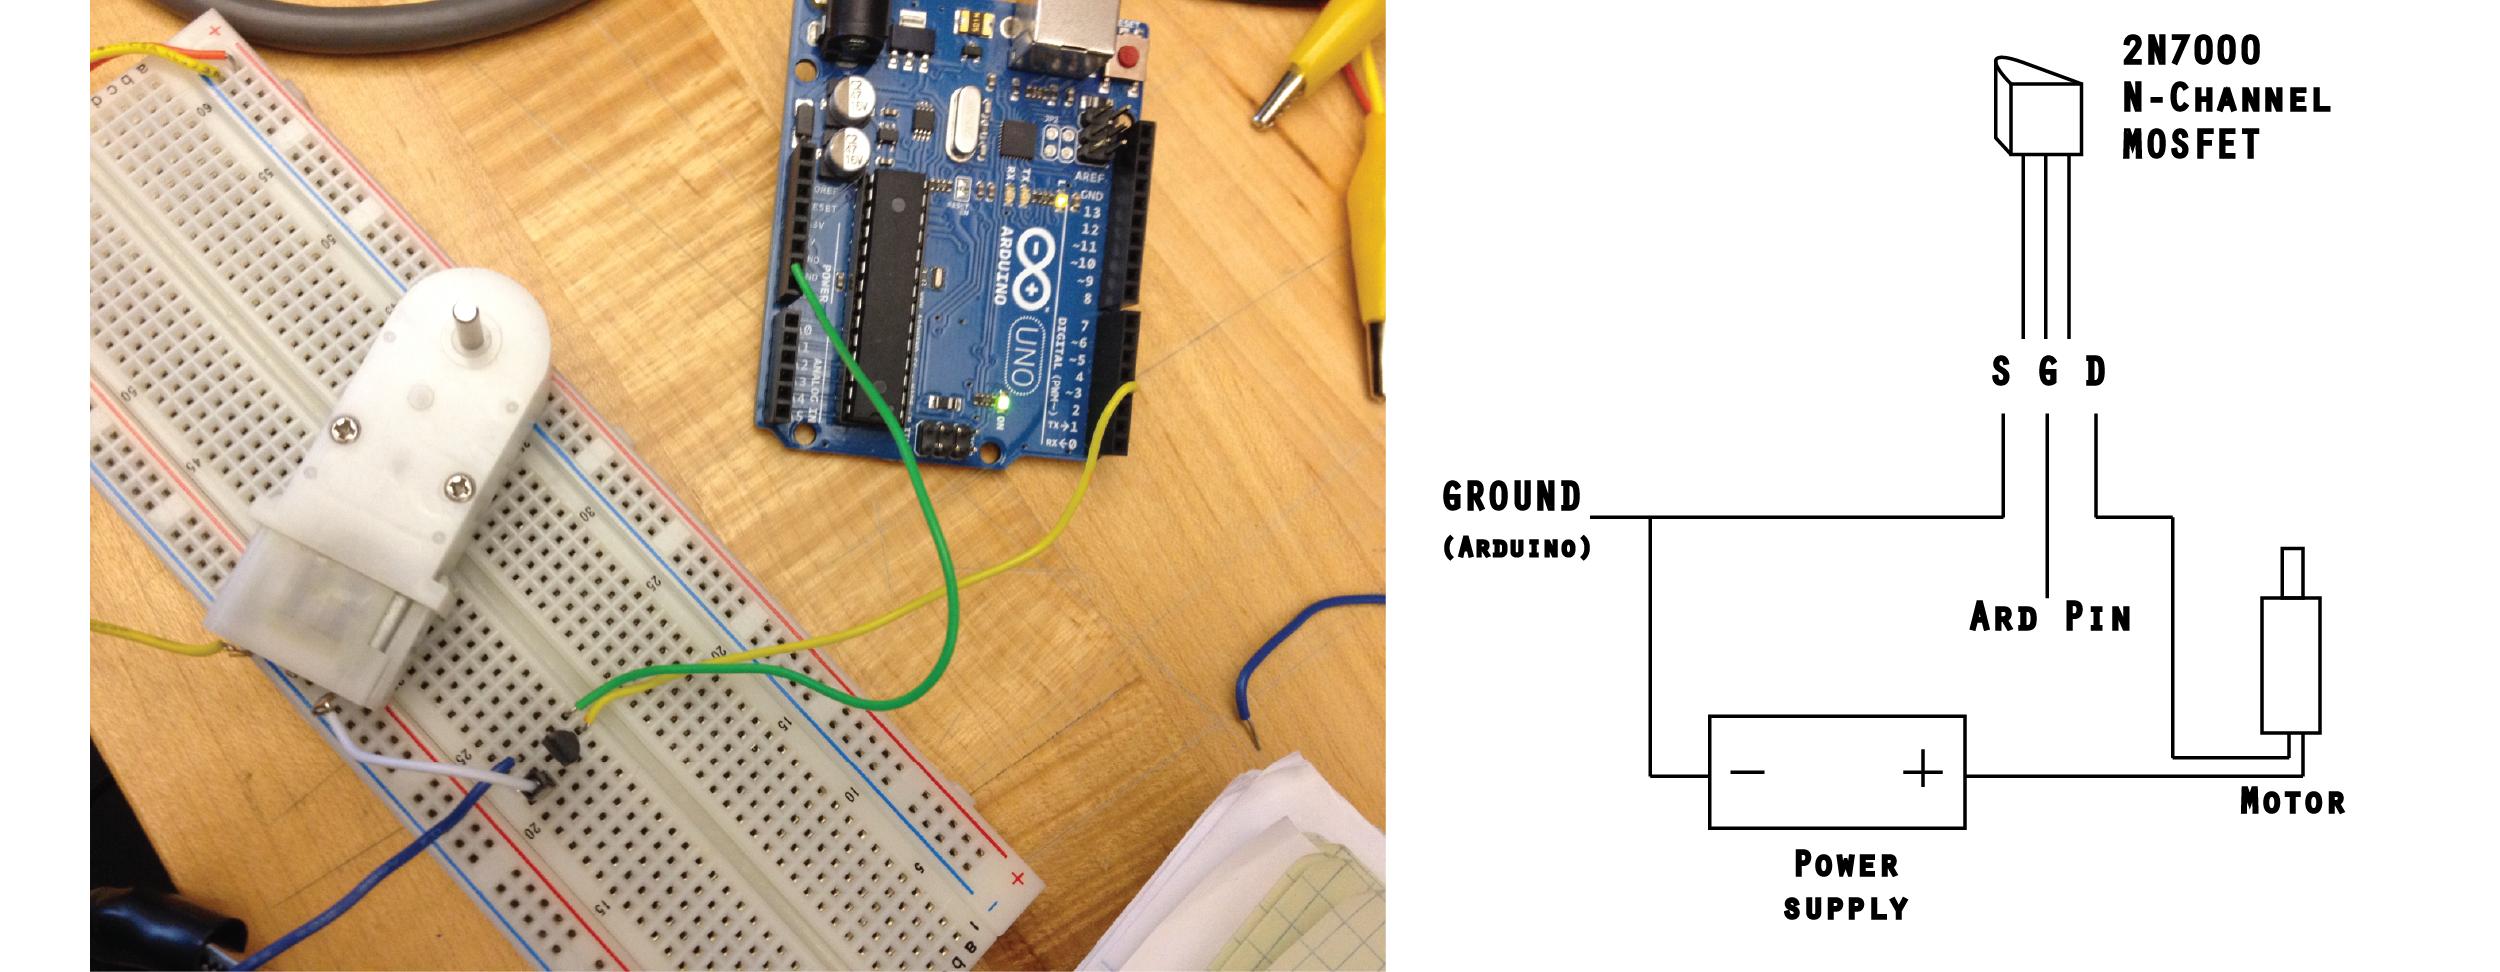 Making Things Interactive Pvirasat House Wiring Diagram Motor Circuit With 2n7000